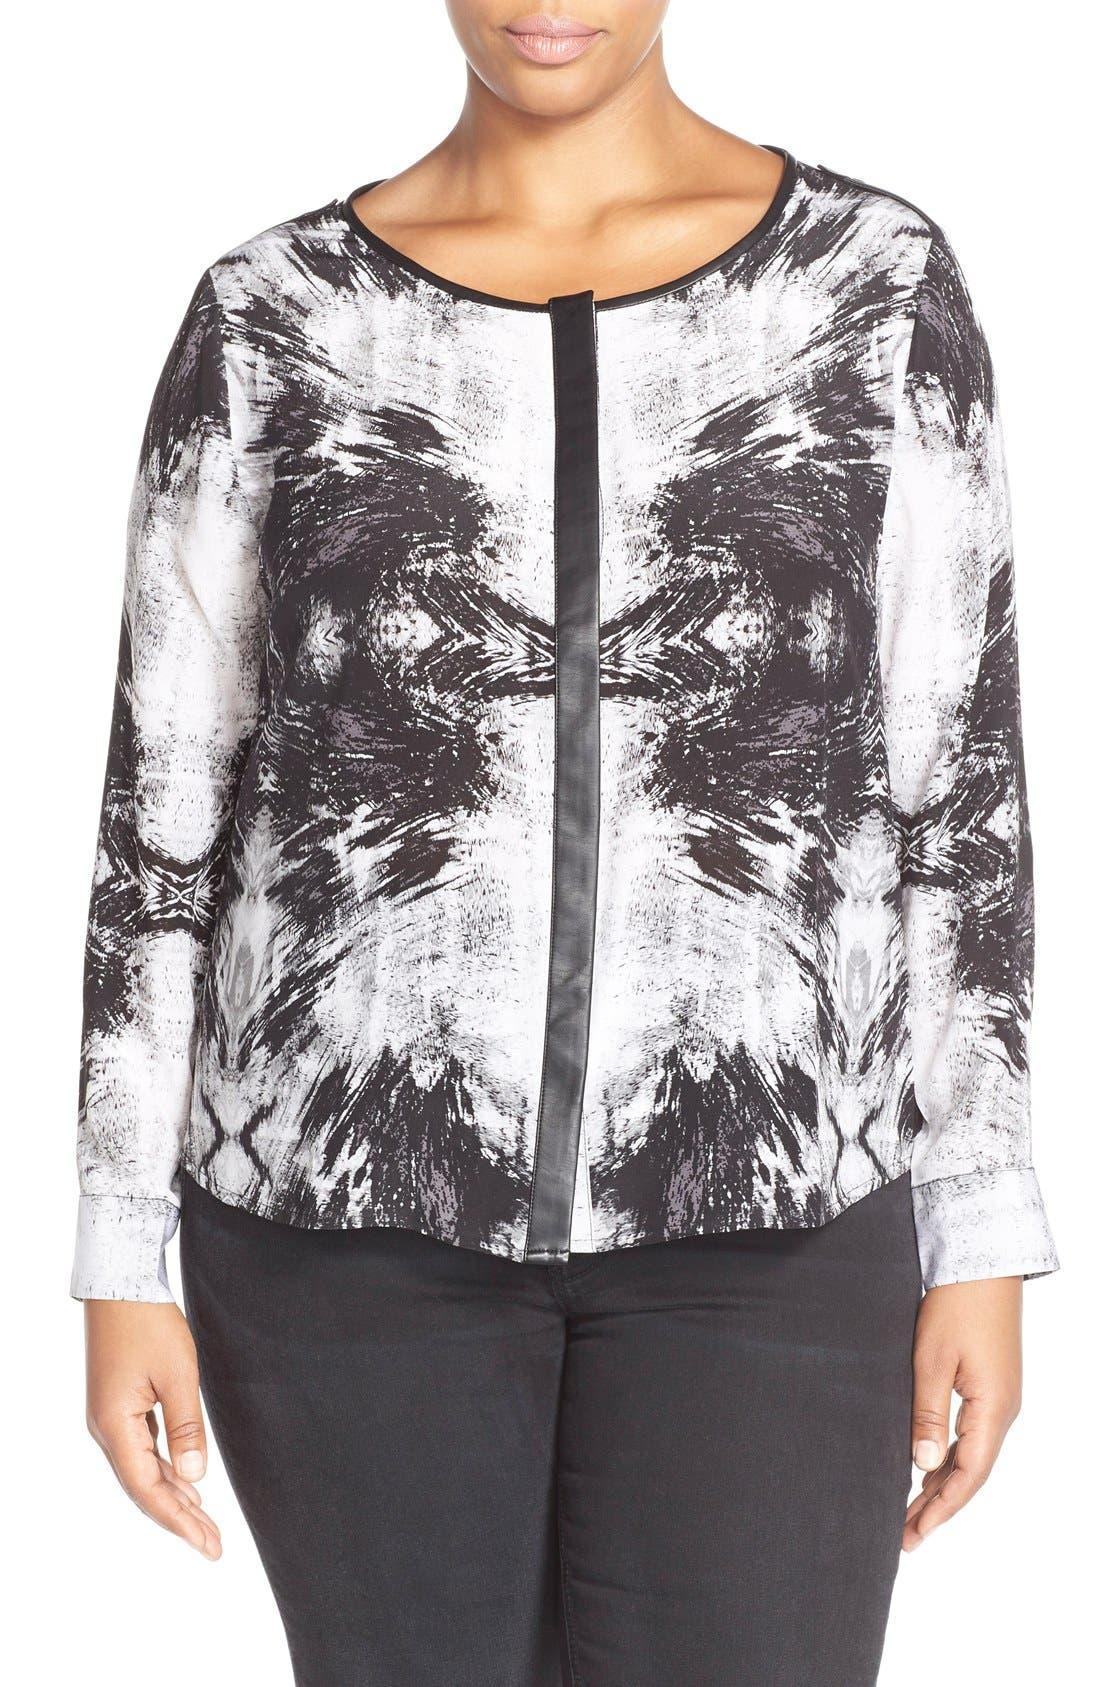 Alternate Image 1 Selected - Tart 'Krista' Mirror Print Silk Top (Plus Size)